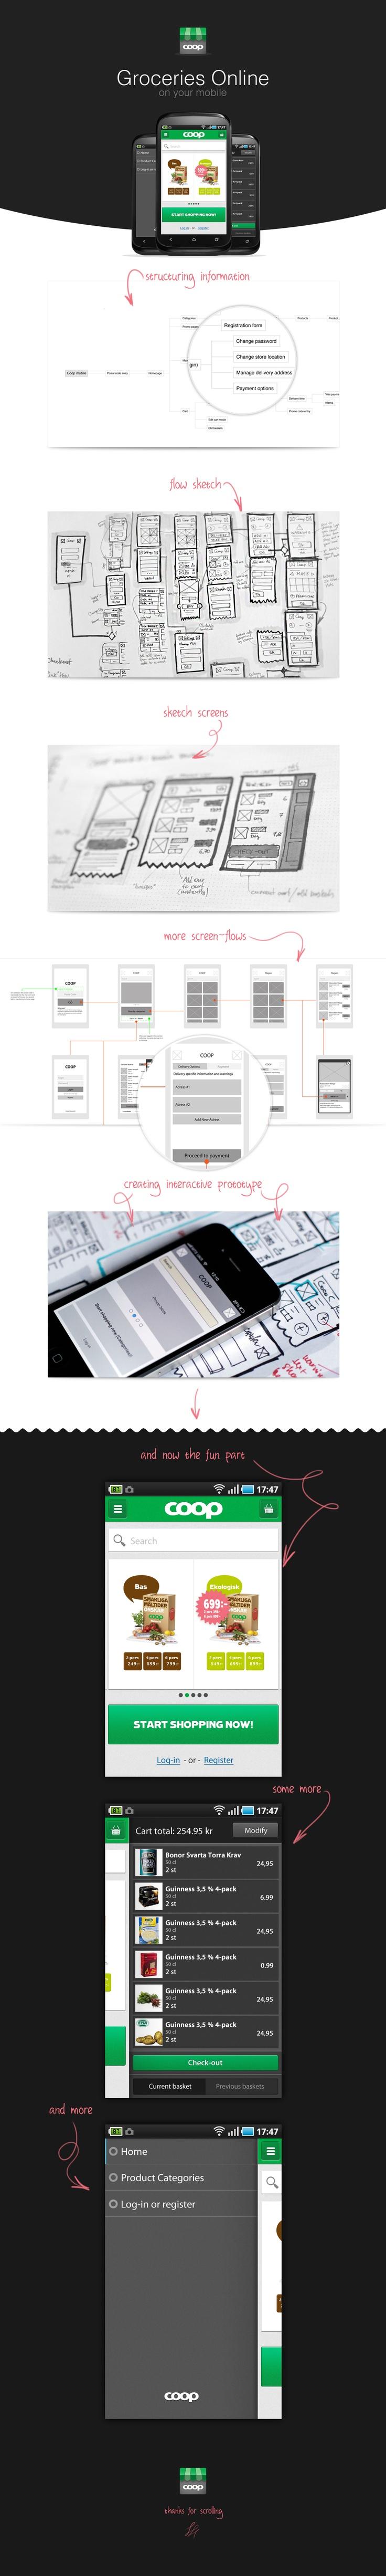 Coop Mobile App